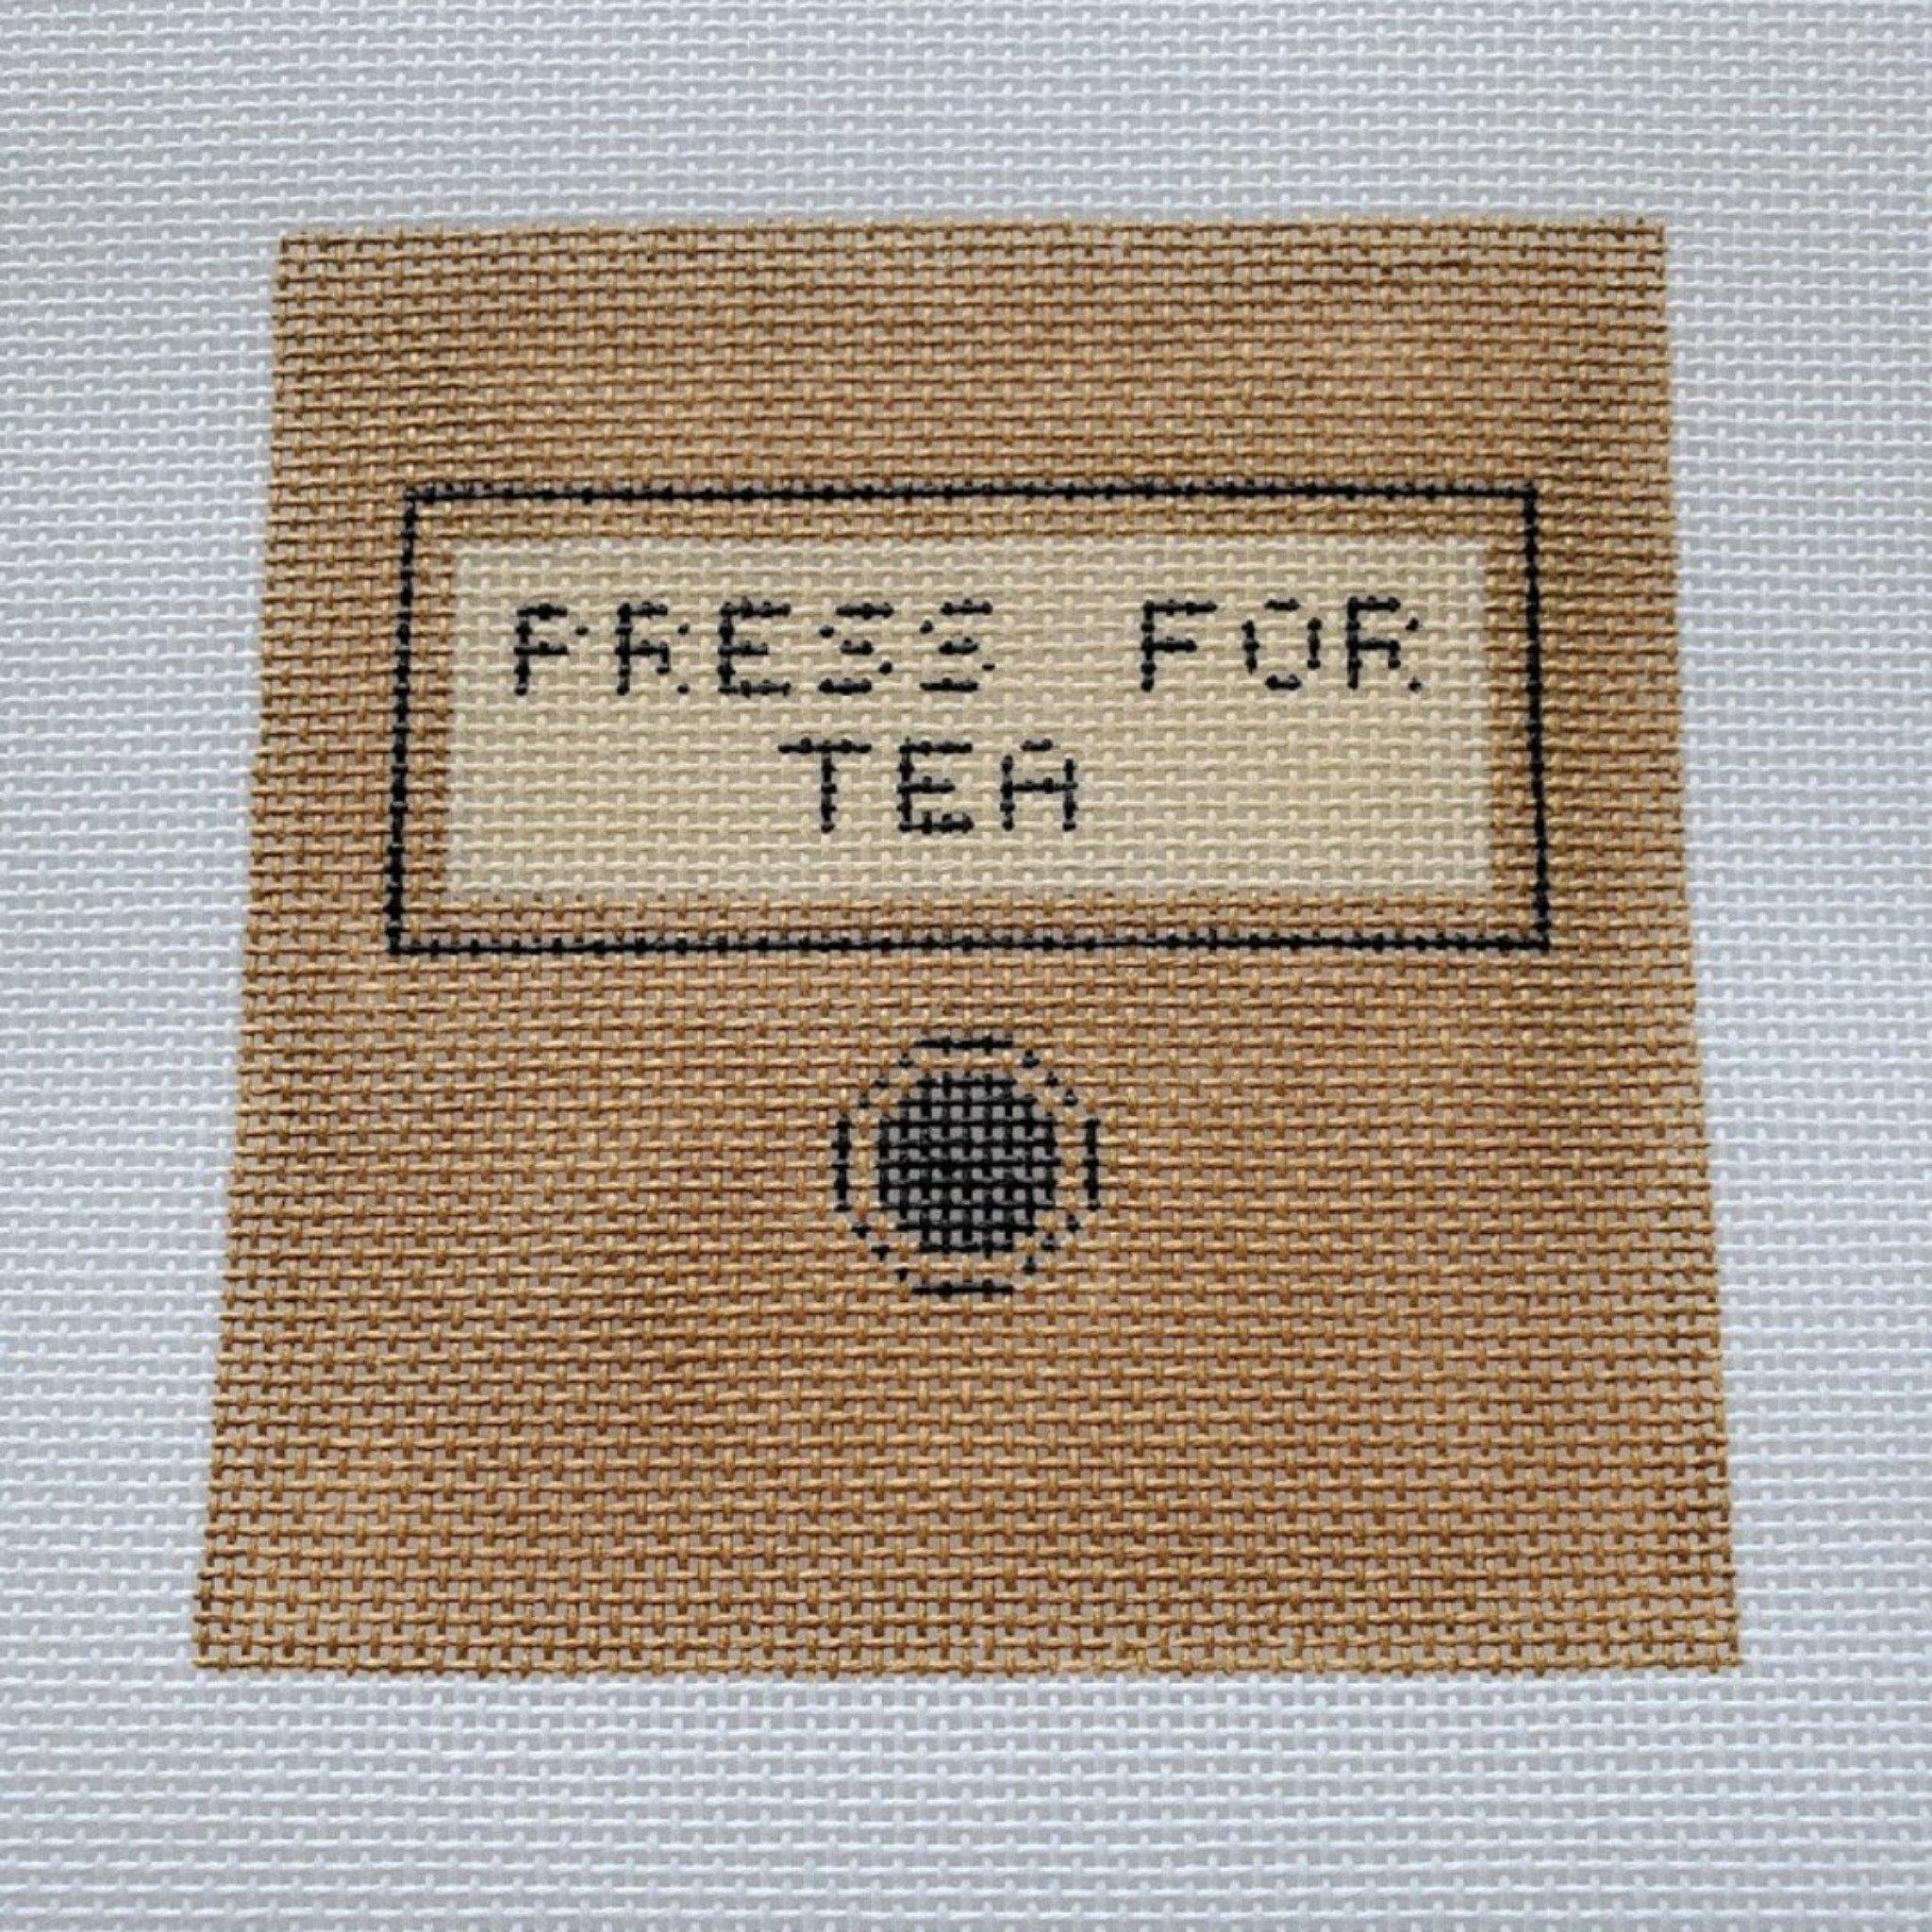 Press for Tea